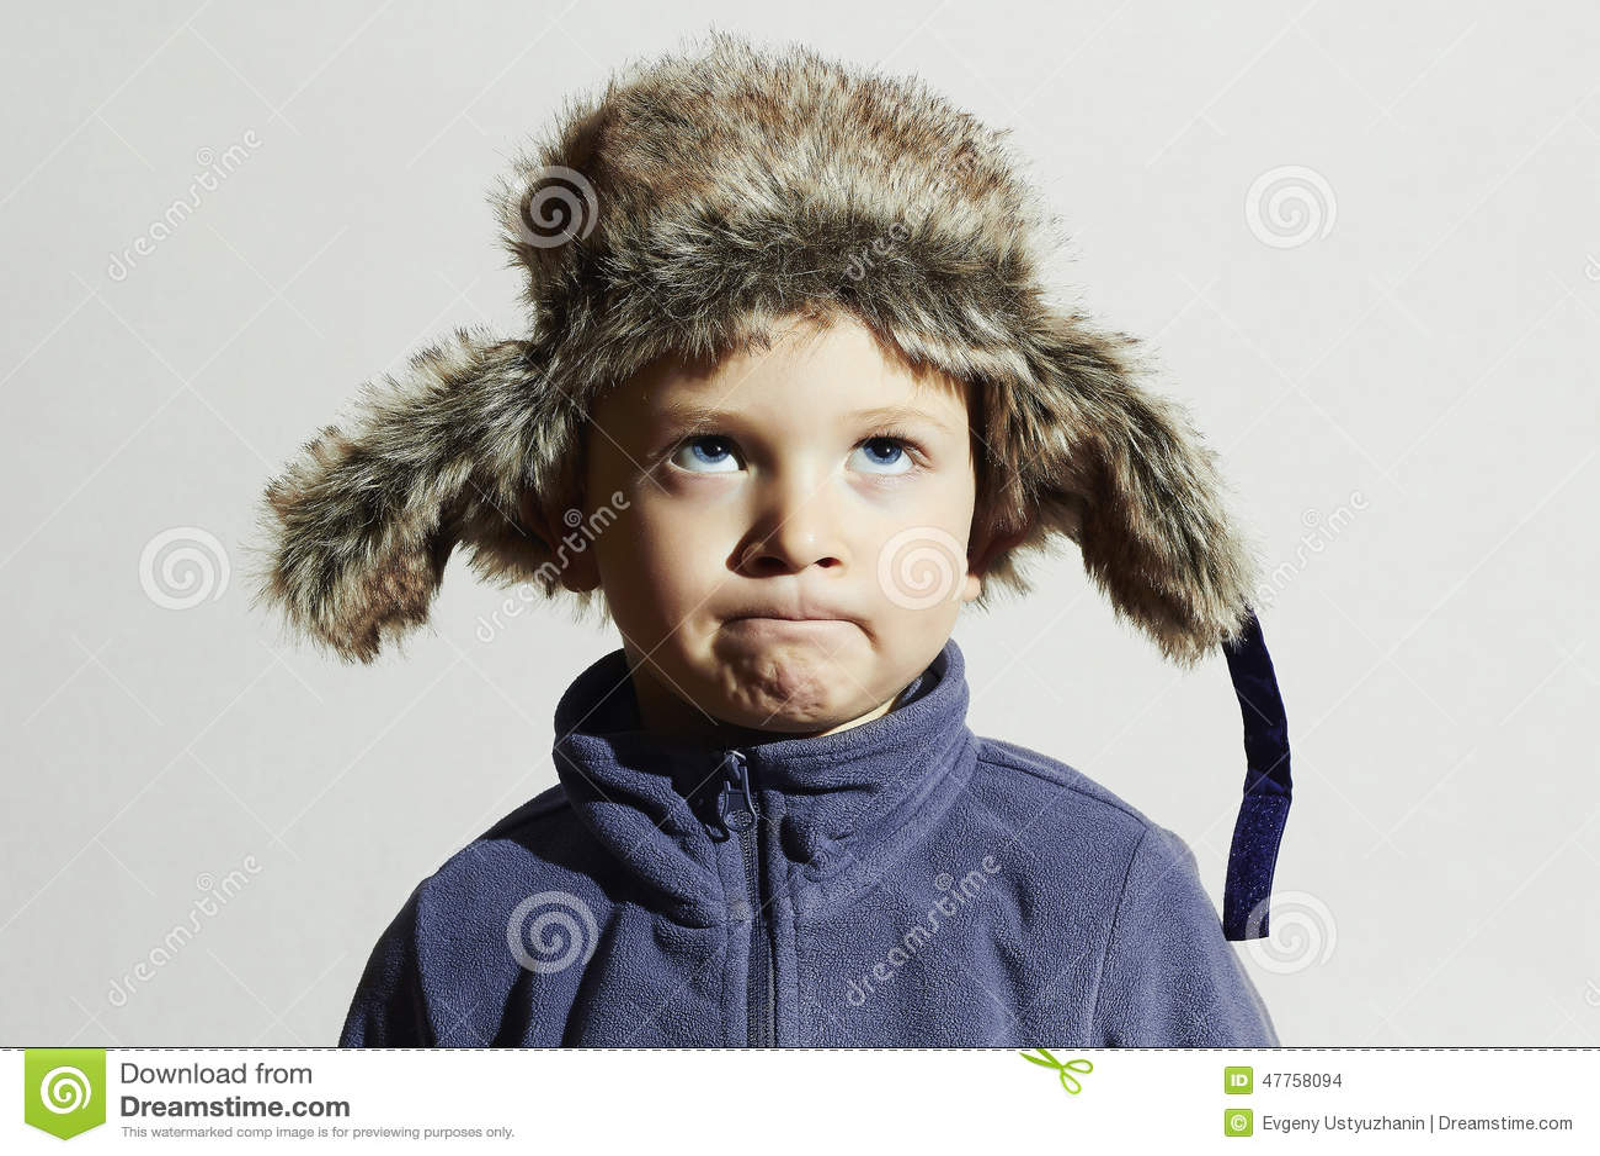 4efda0fb7970 Funny Child In Fur Hat.fashion Casual Winter Style.little Boy Stock ...